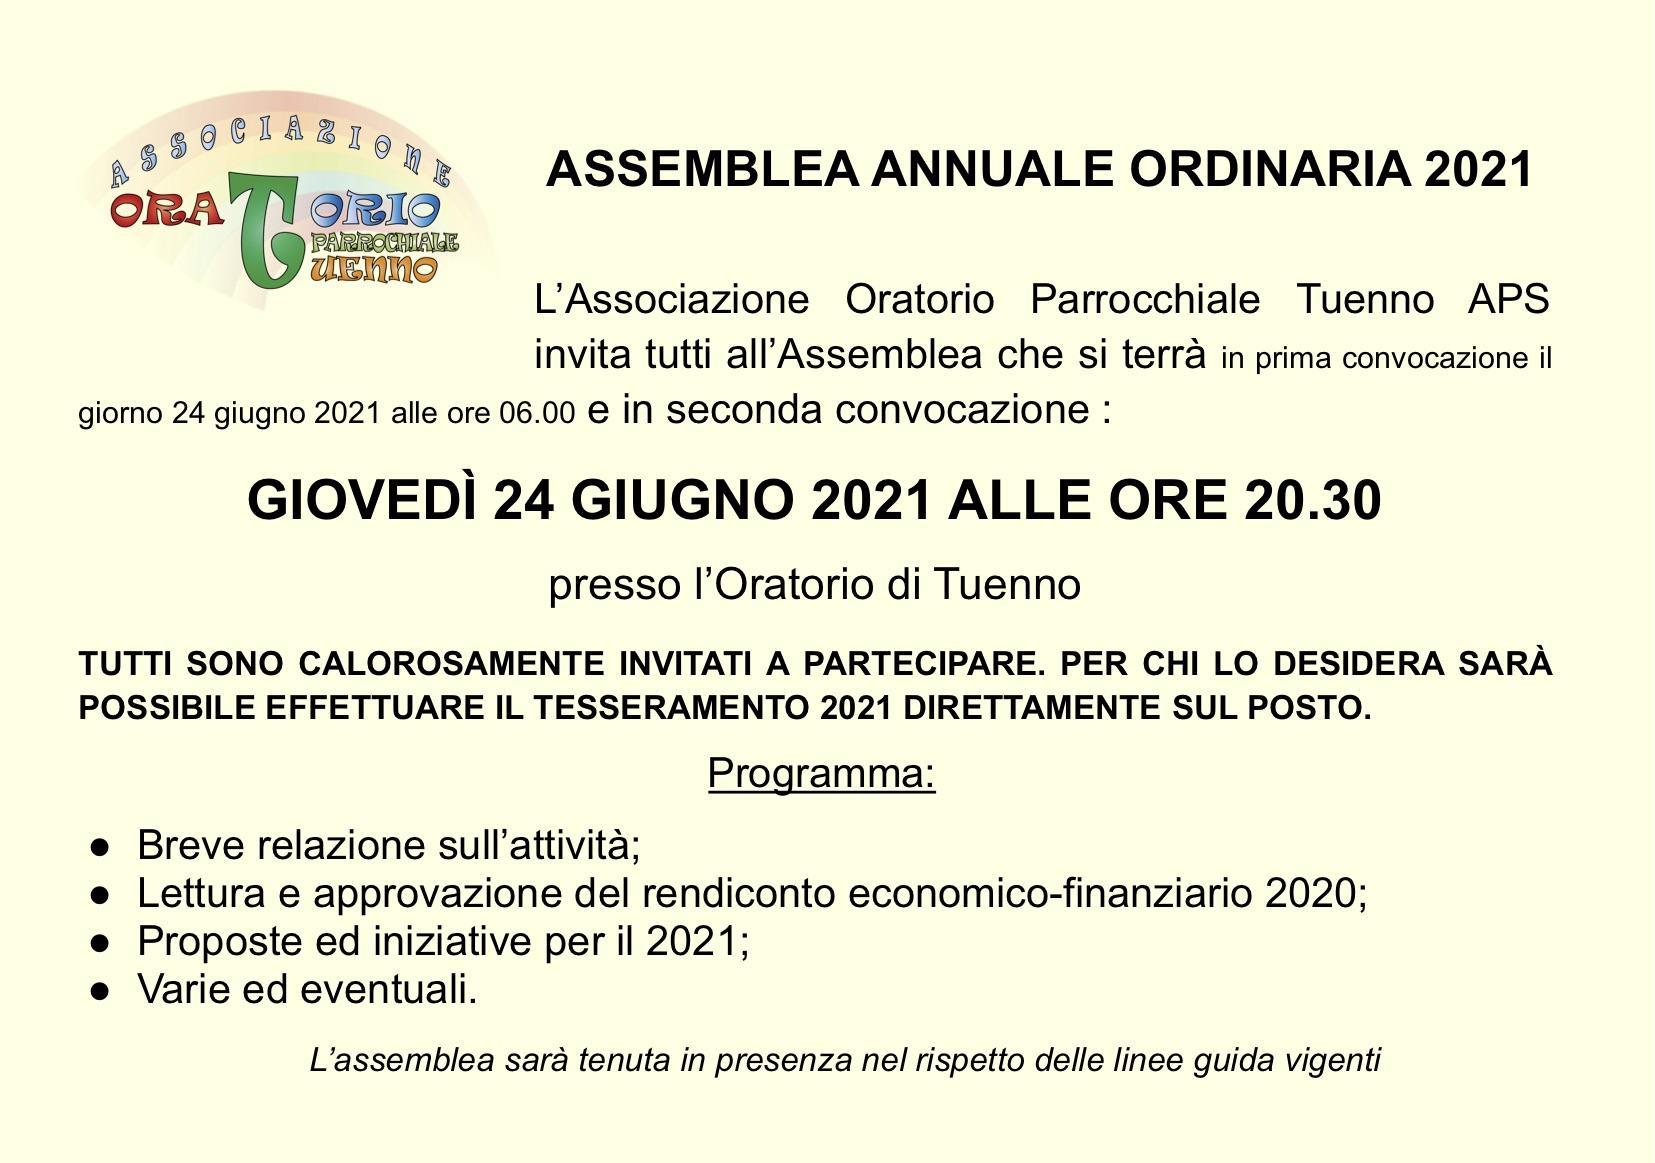 ASSEMBLEA ANNUALE ORDINARIA 2021